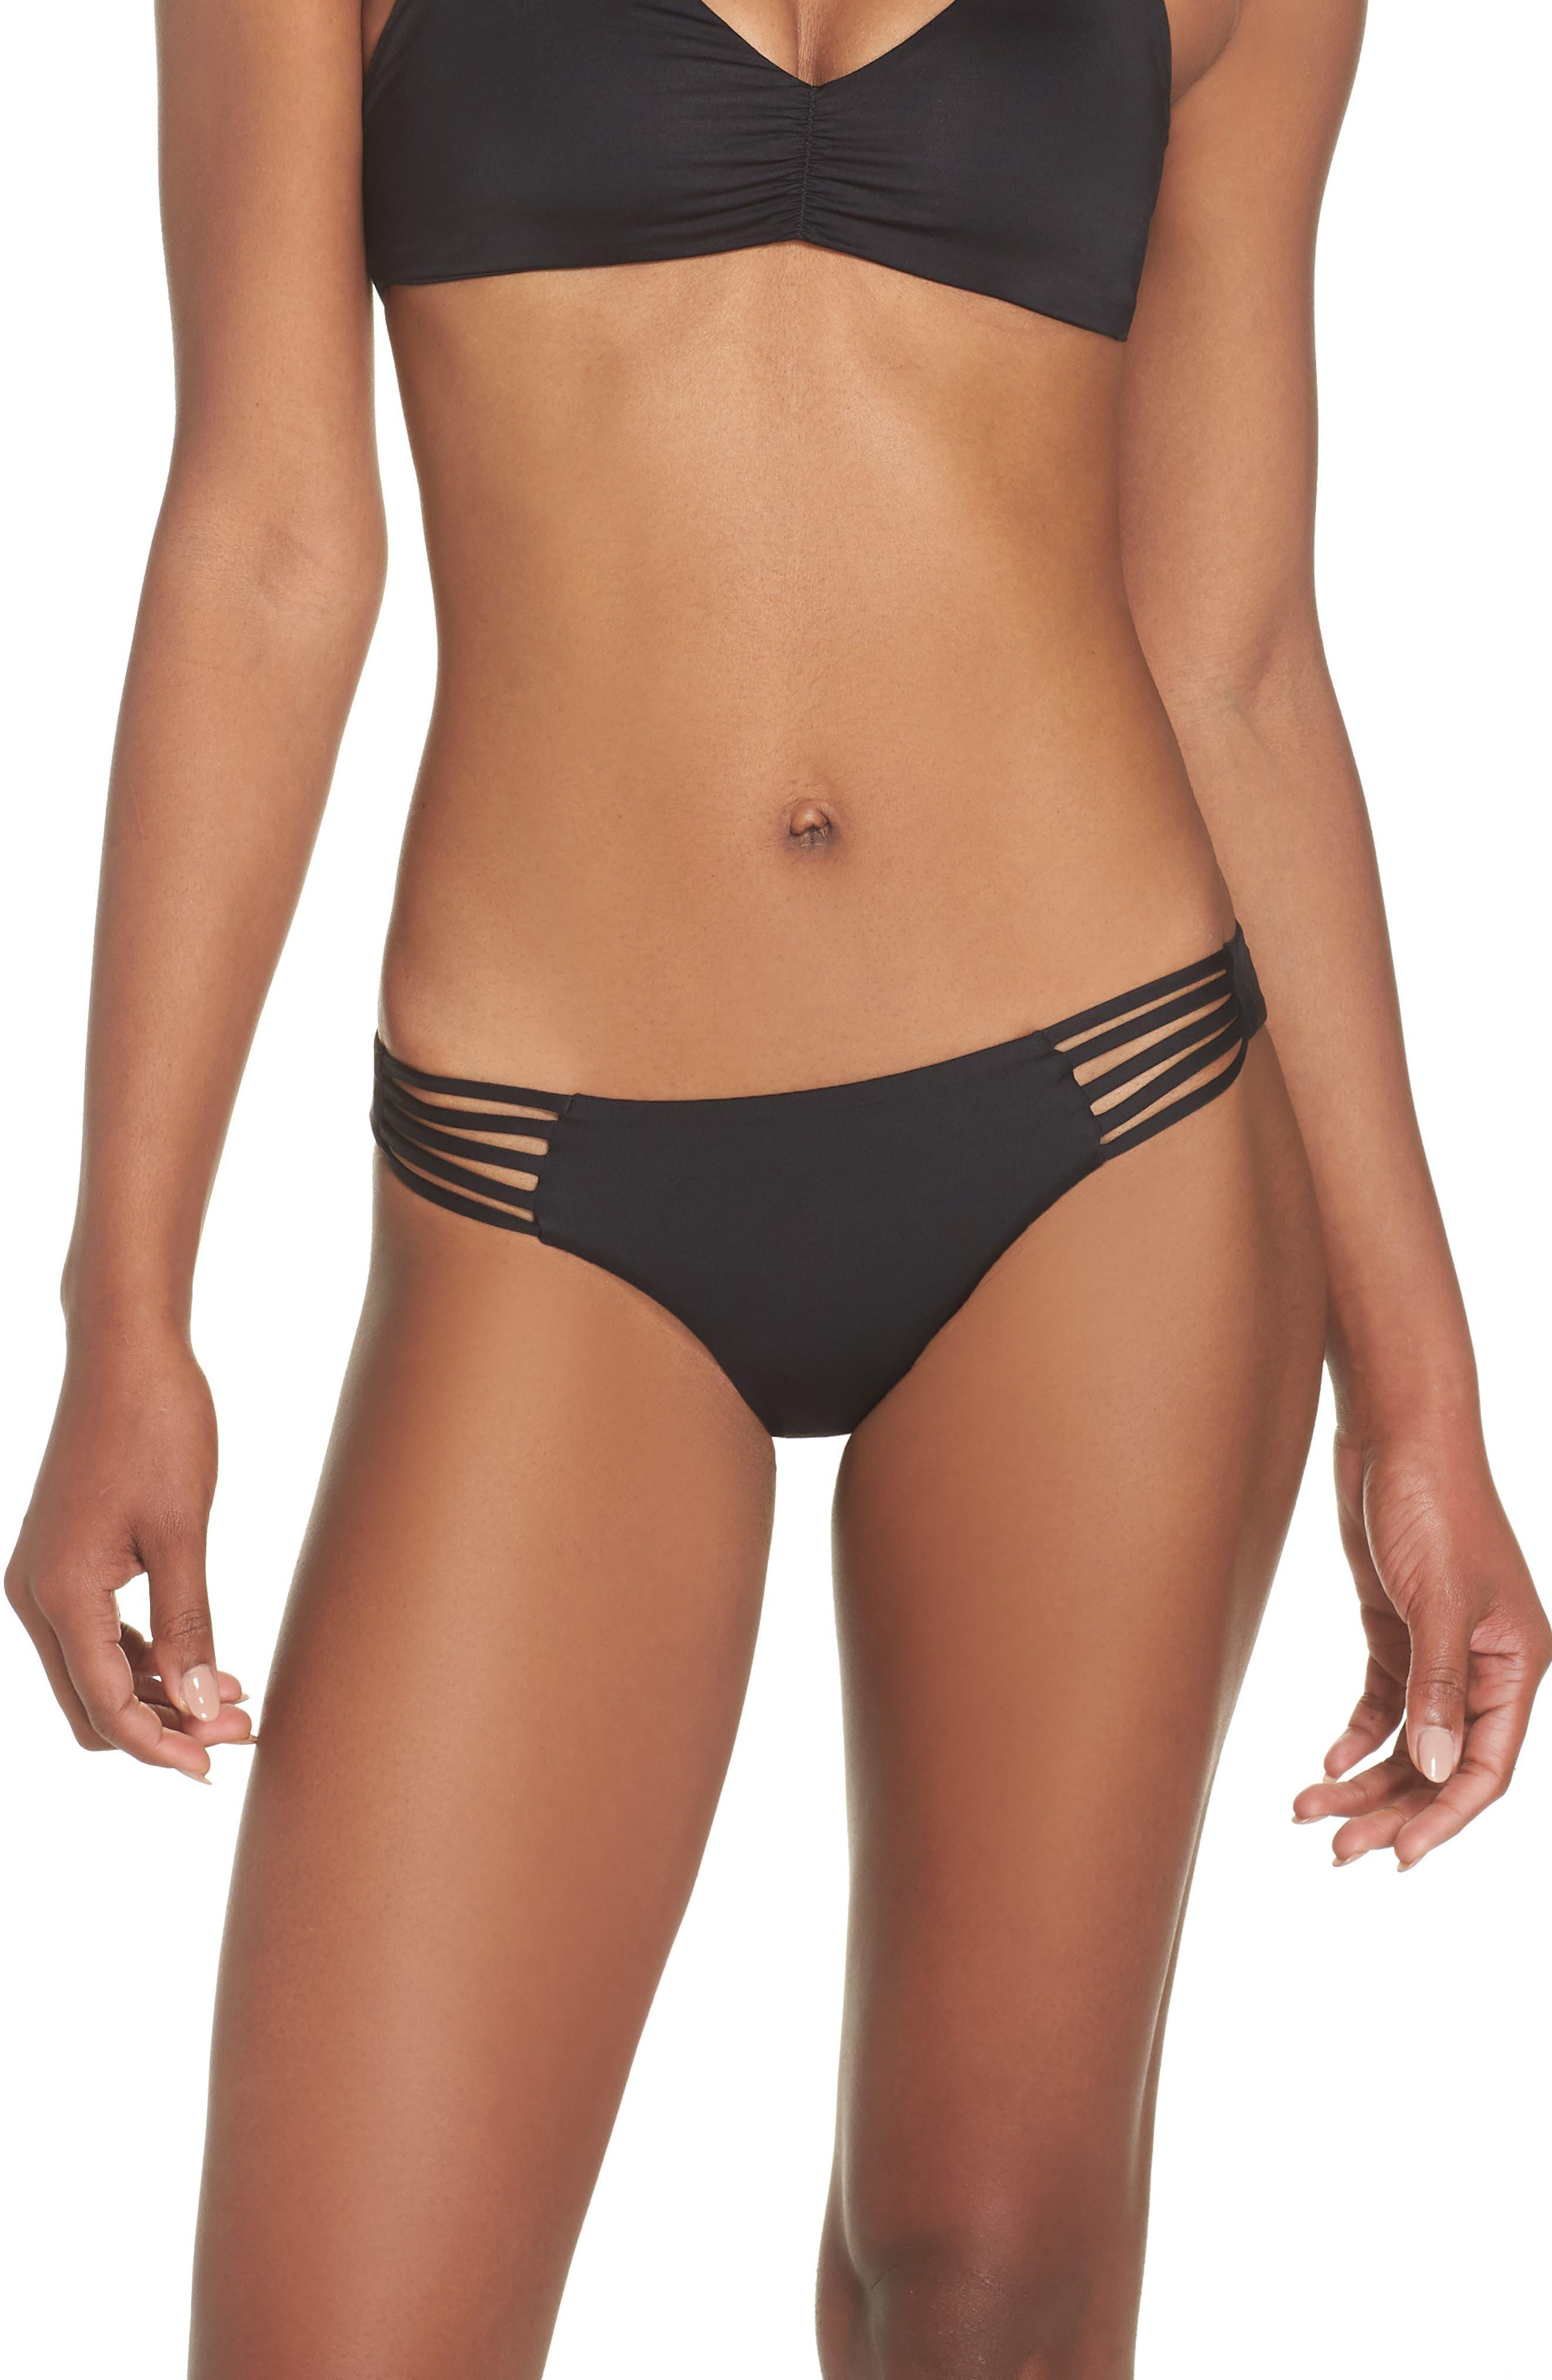 Seaglass Bay Reversible Bikini Bottoms,                         Main,                         color, BLACK